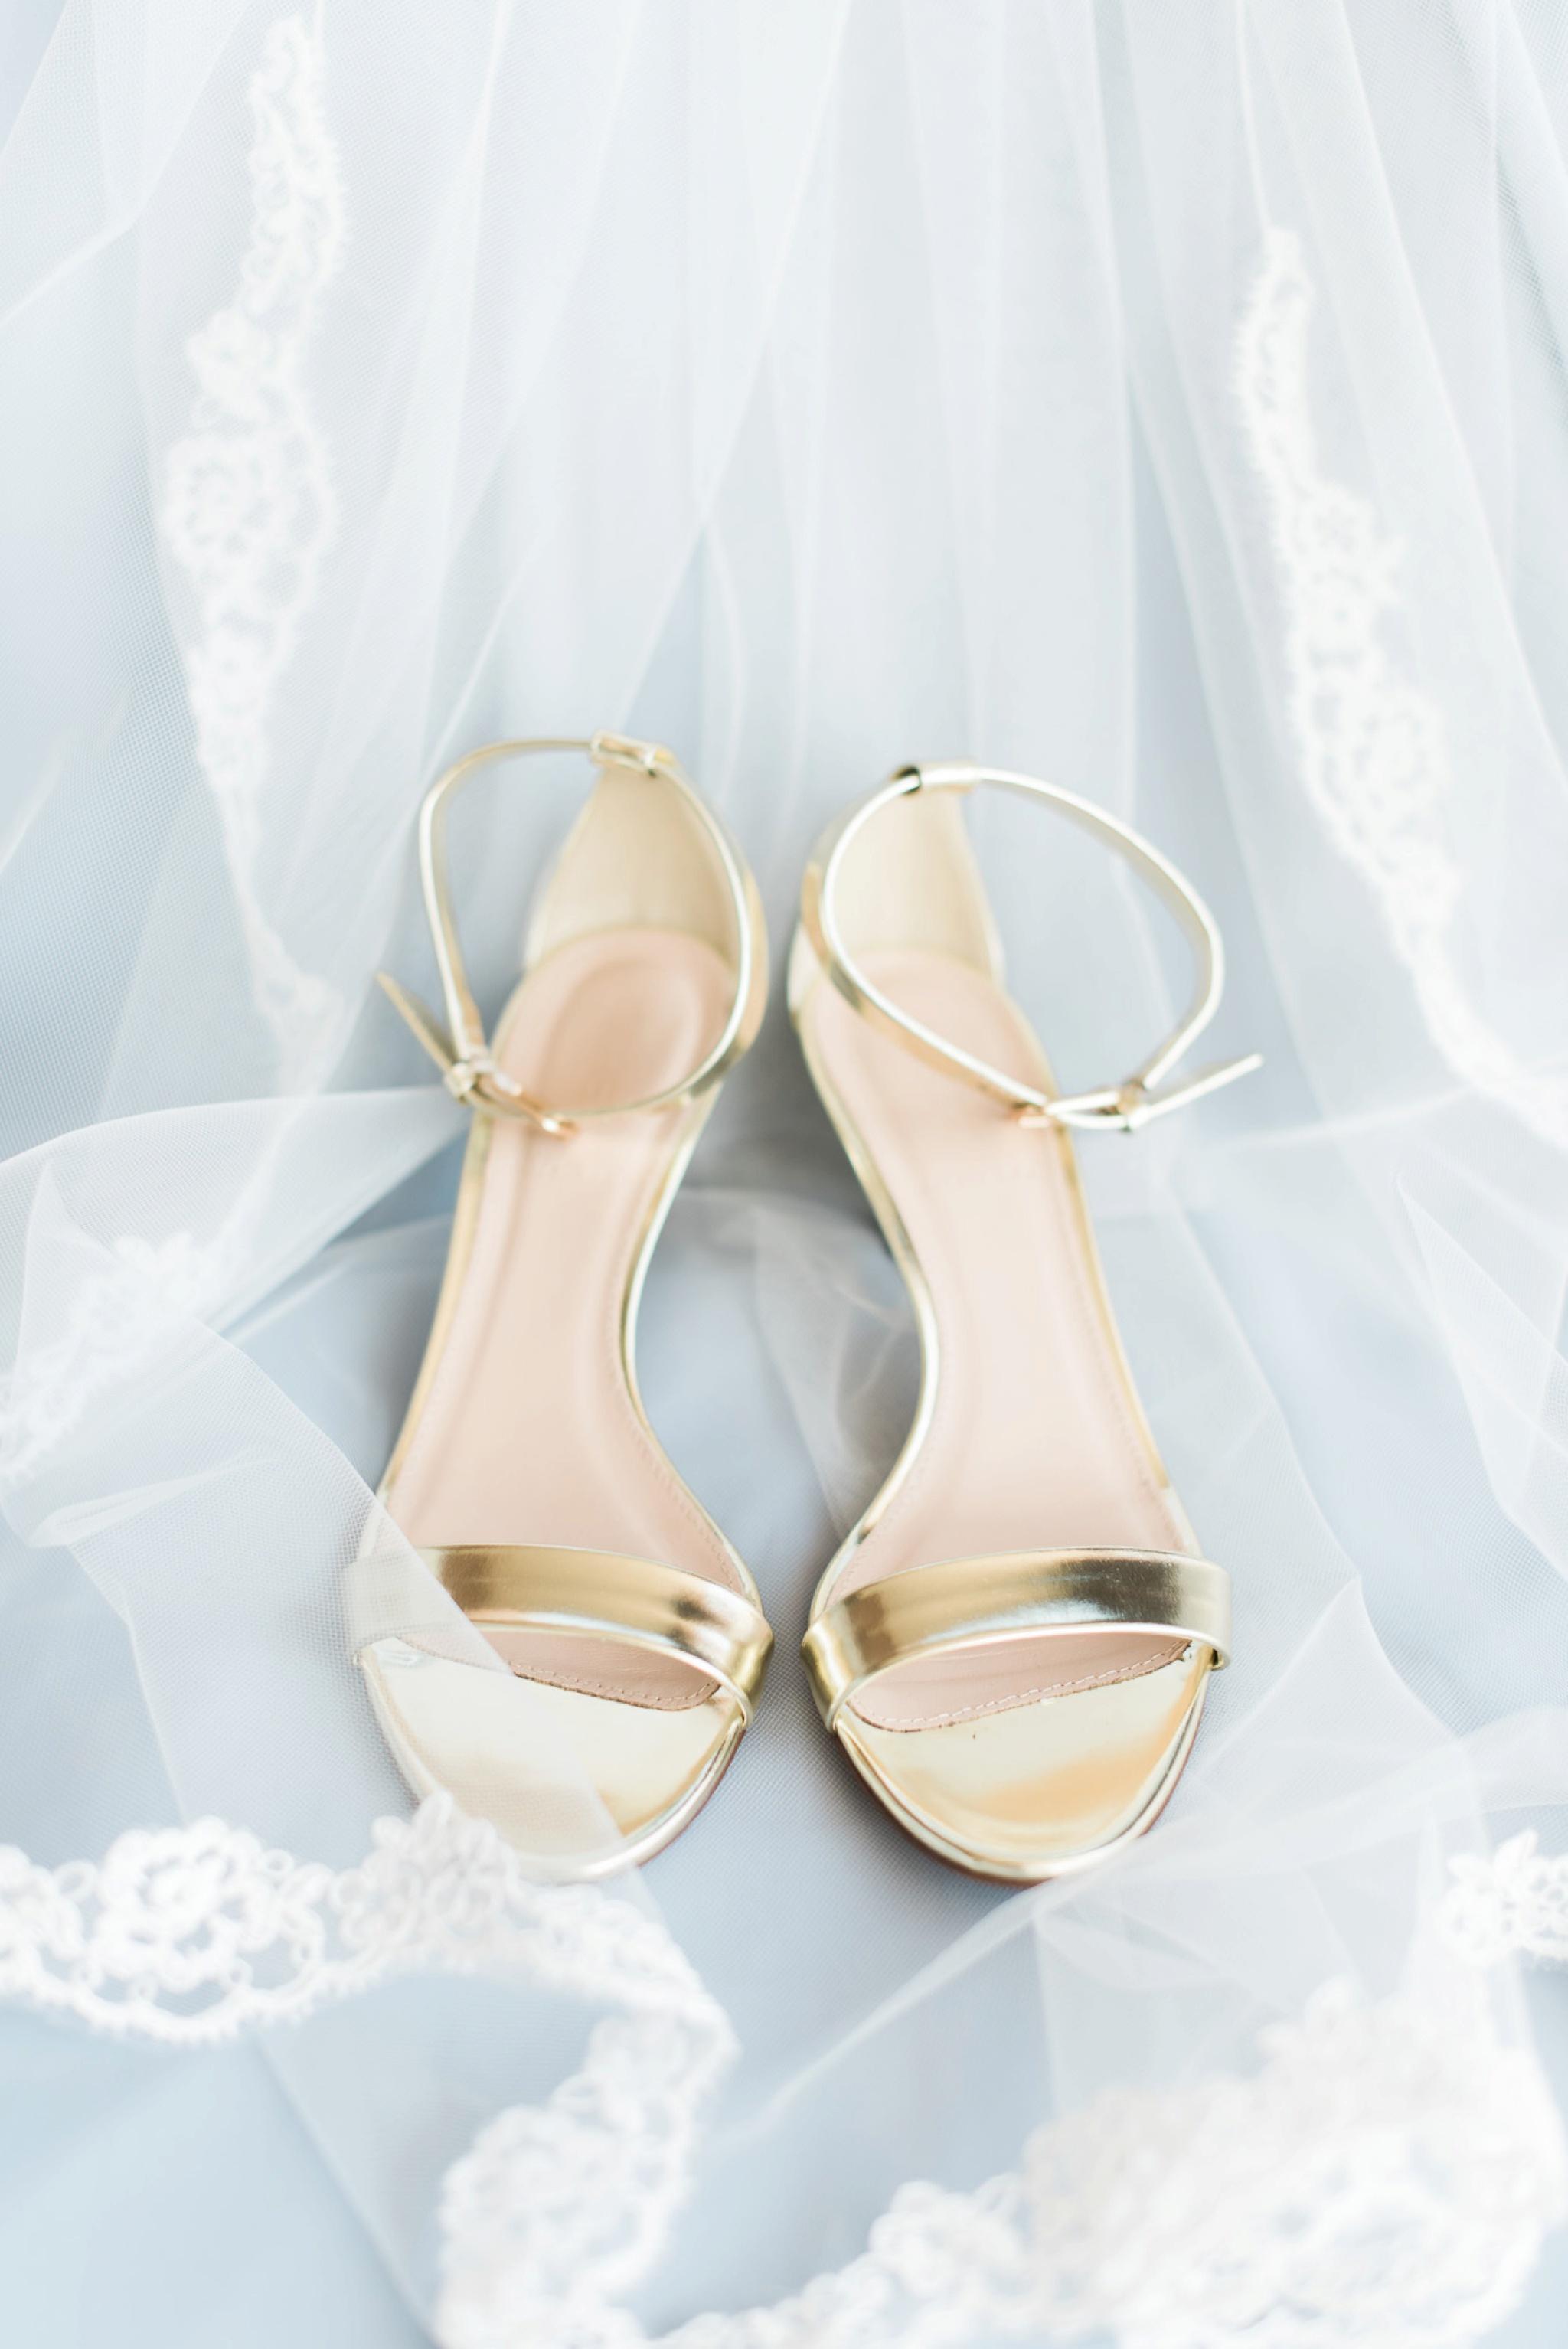 sunbury-ohio-wedding-hannah-johnathan_0009.jpg